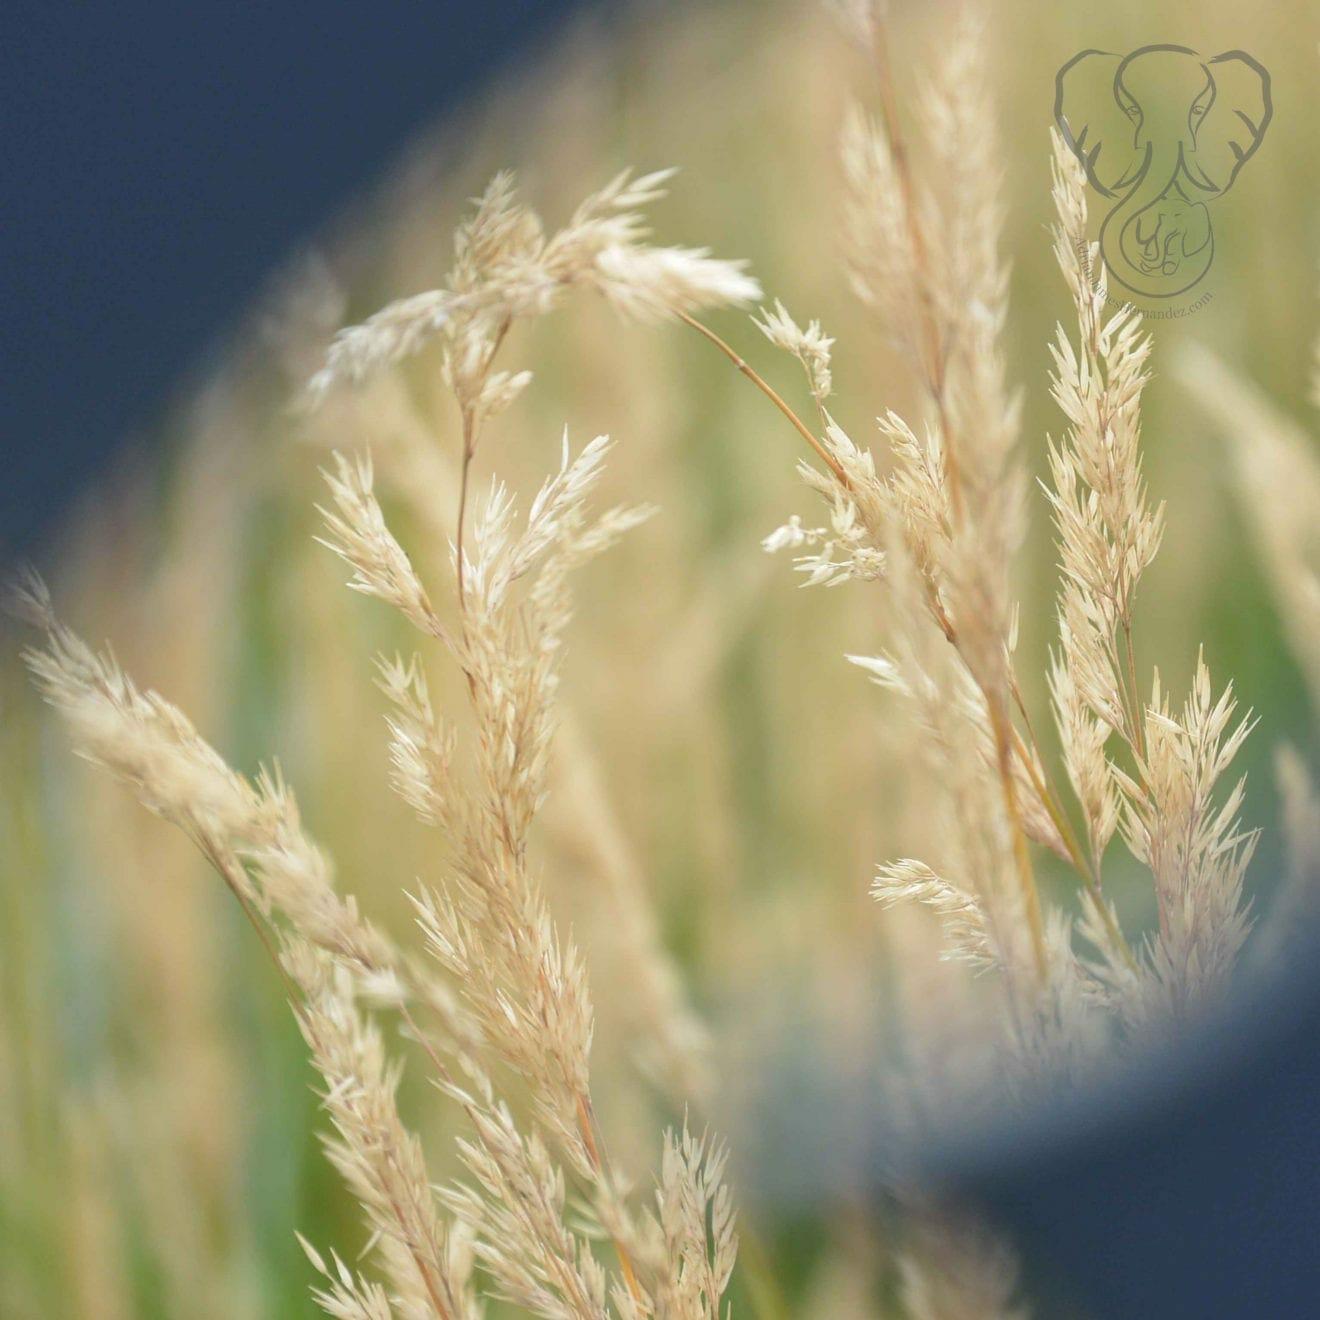 View from a butterfly cut-out, Assiniboine Park, Winnipeg, Manitoba (Miranda Hernandez)